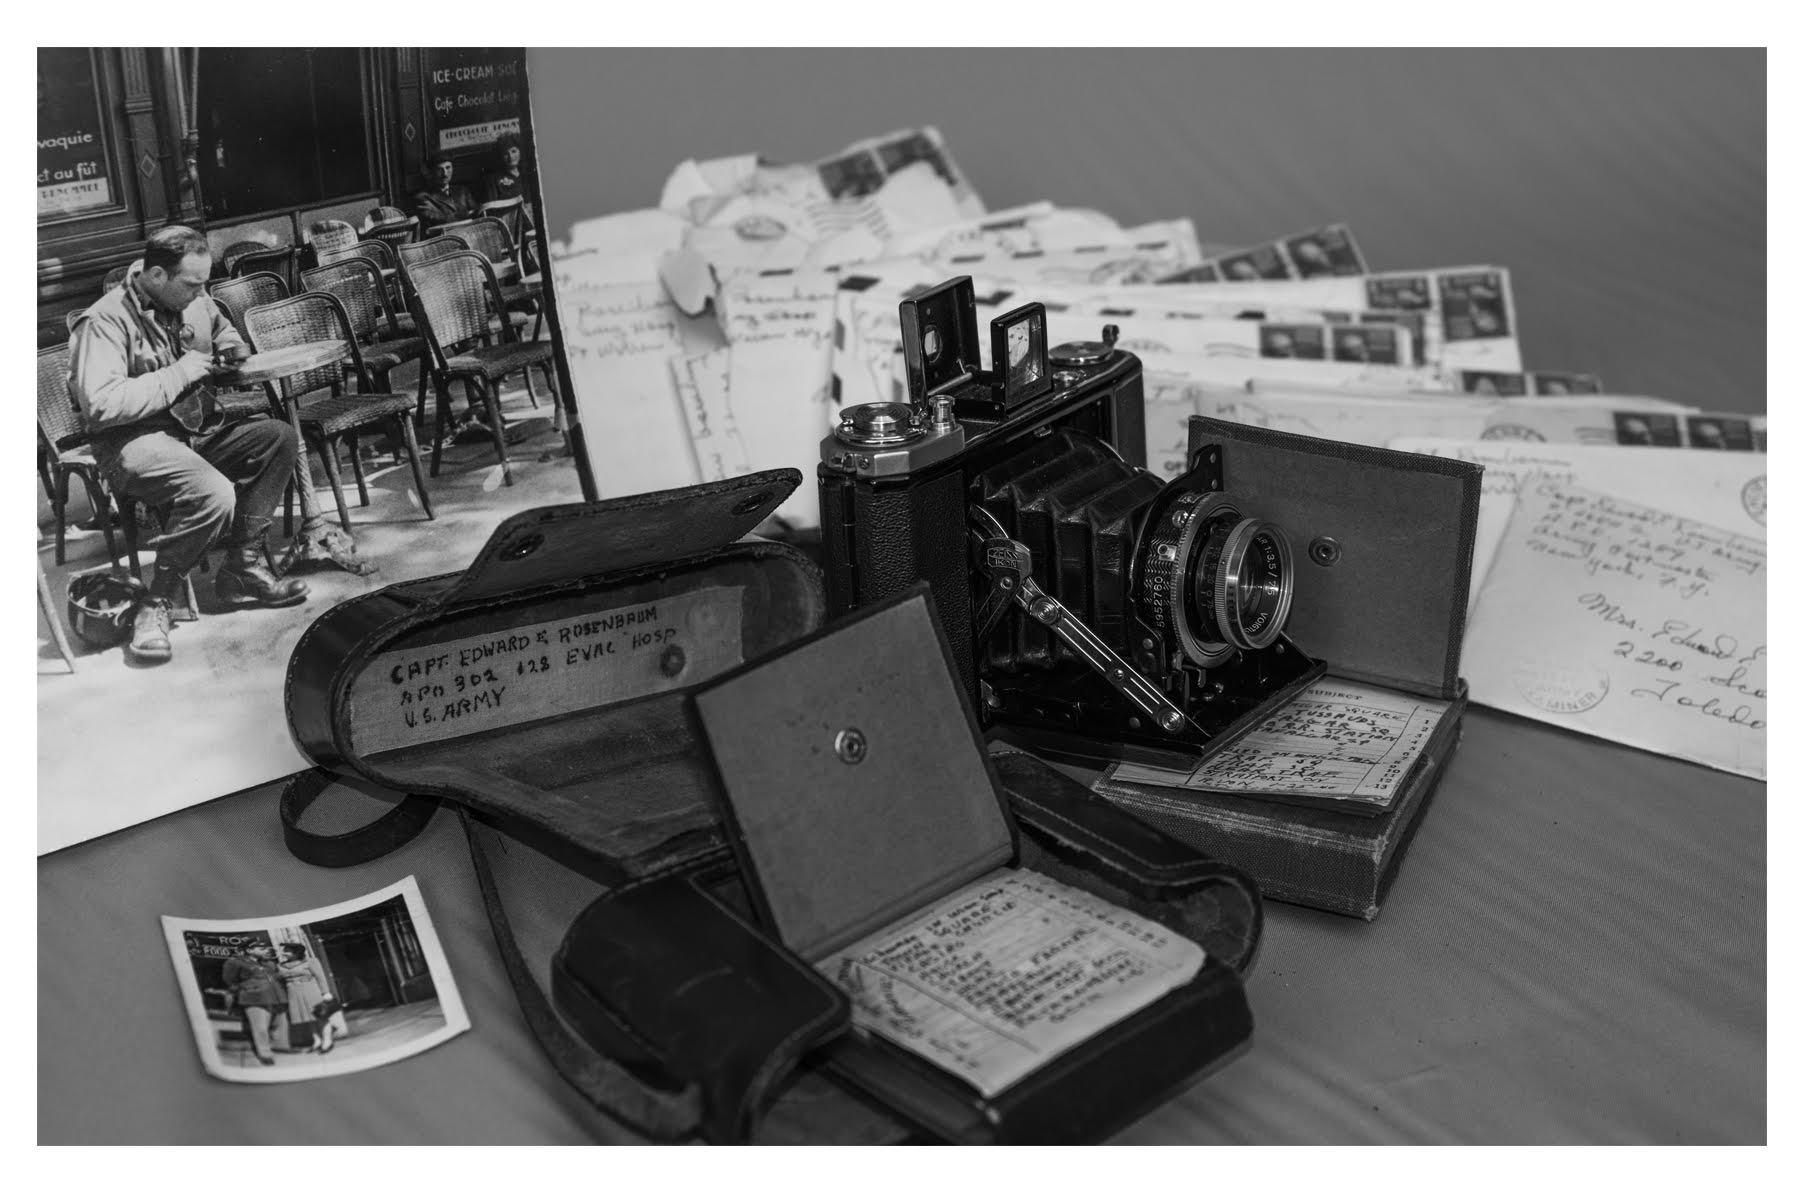 Rachel Rosenbaum grandfather camera equipment